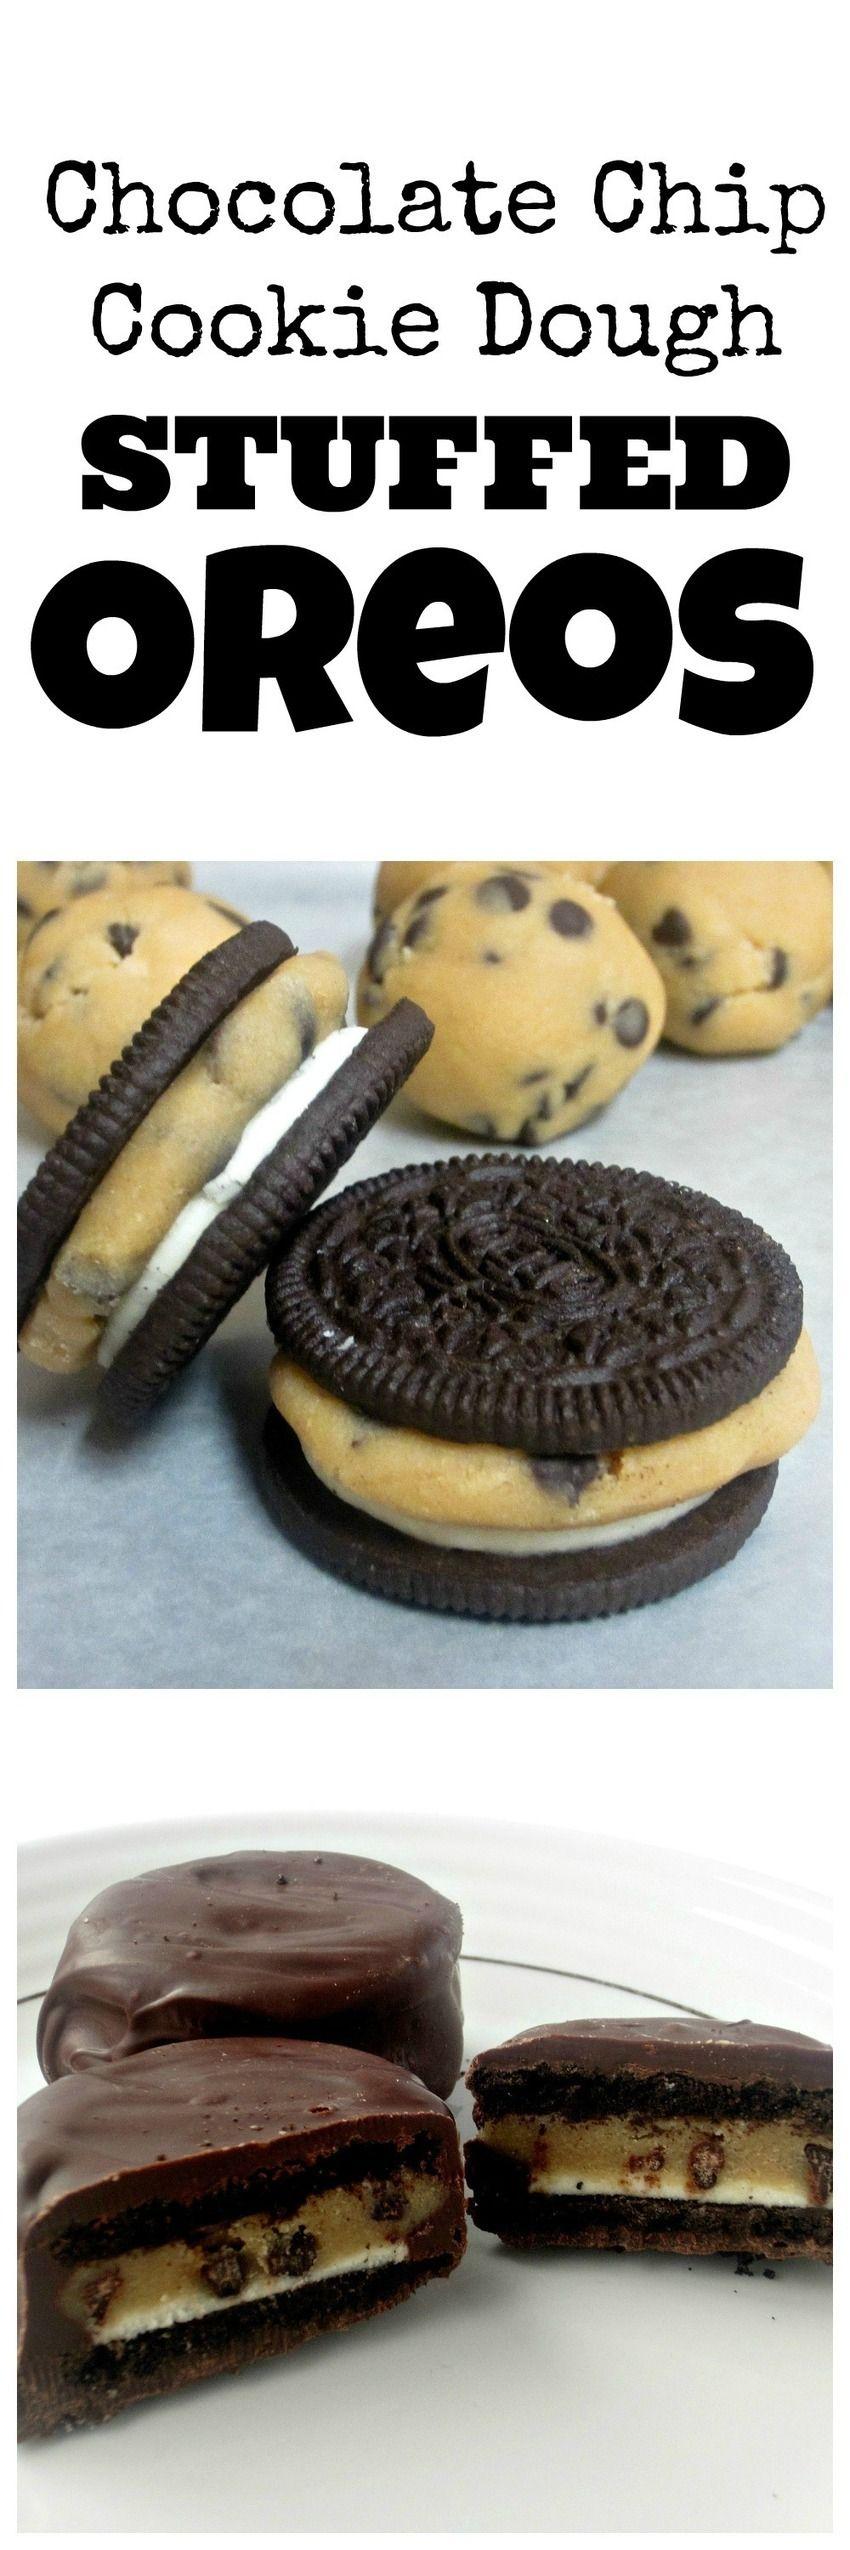 #Dessert / Chocolate Chip Cookie Dough Stuffed Oreos